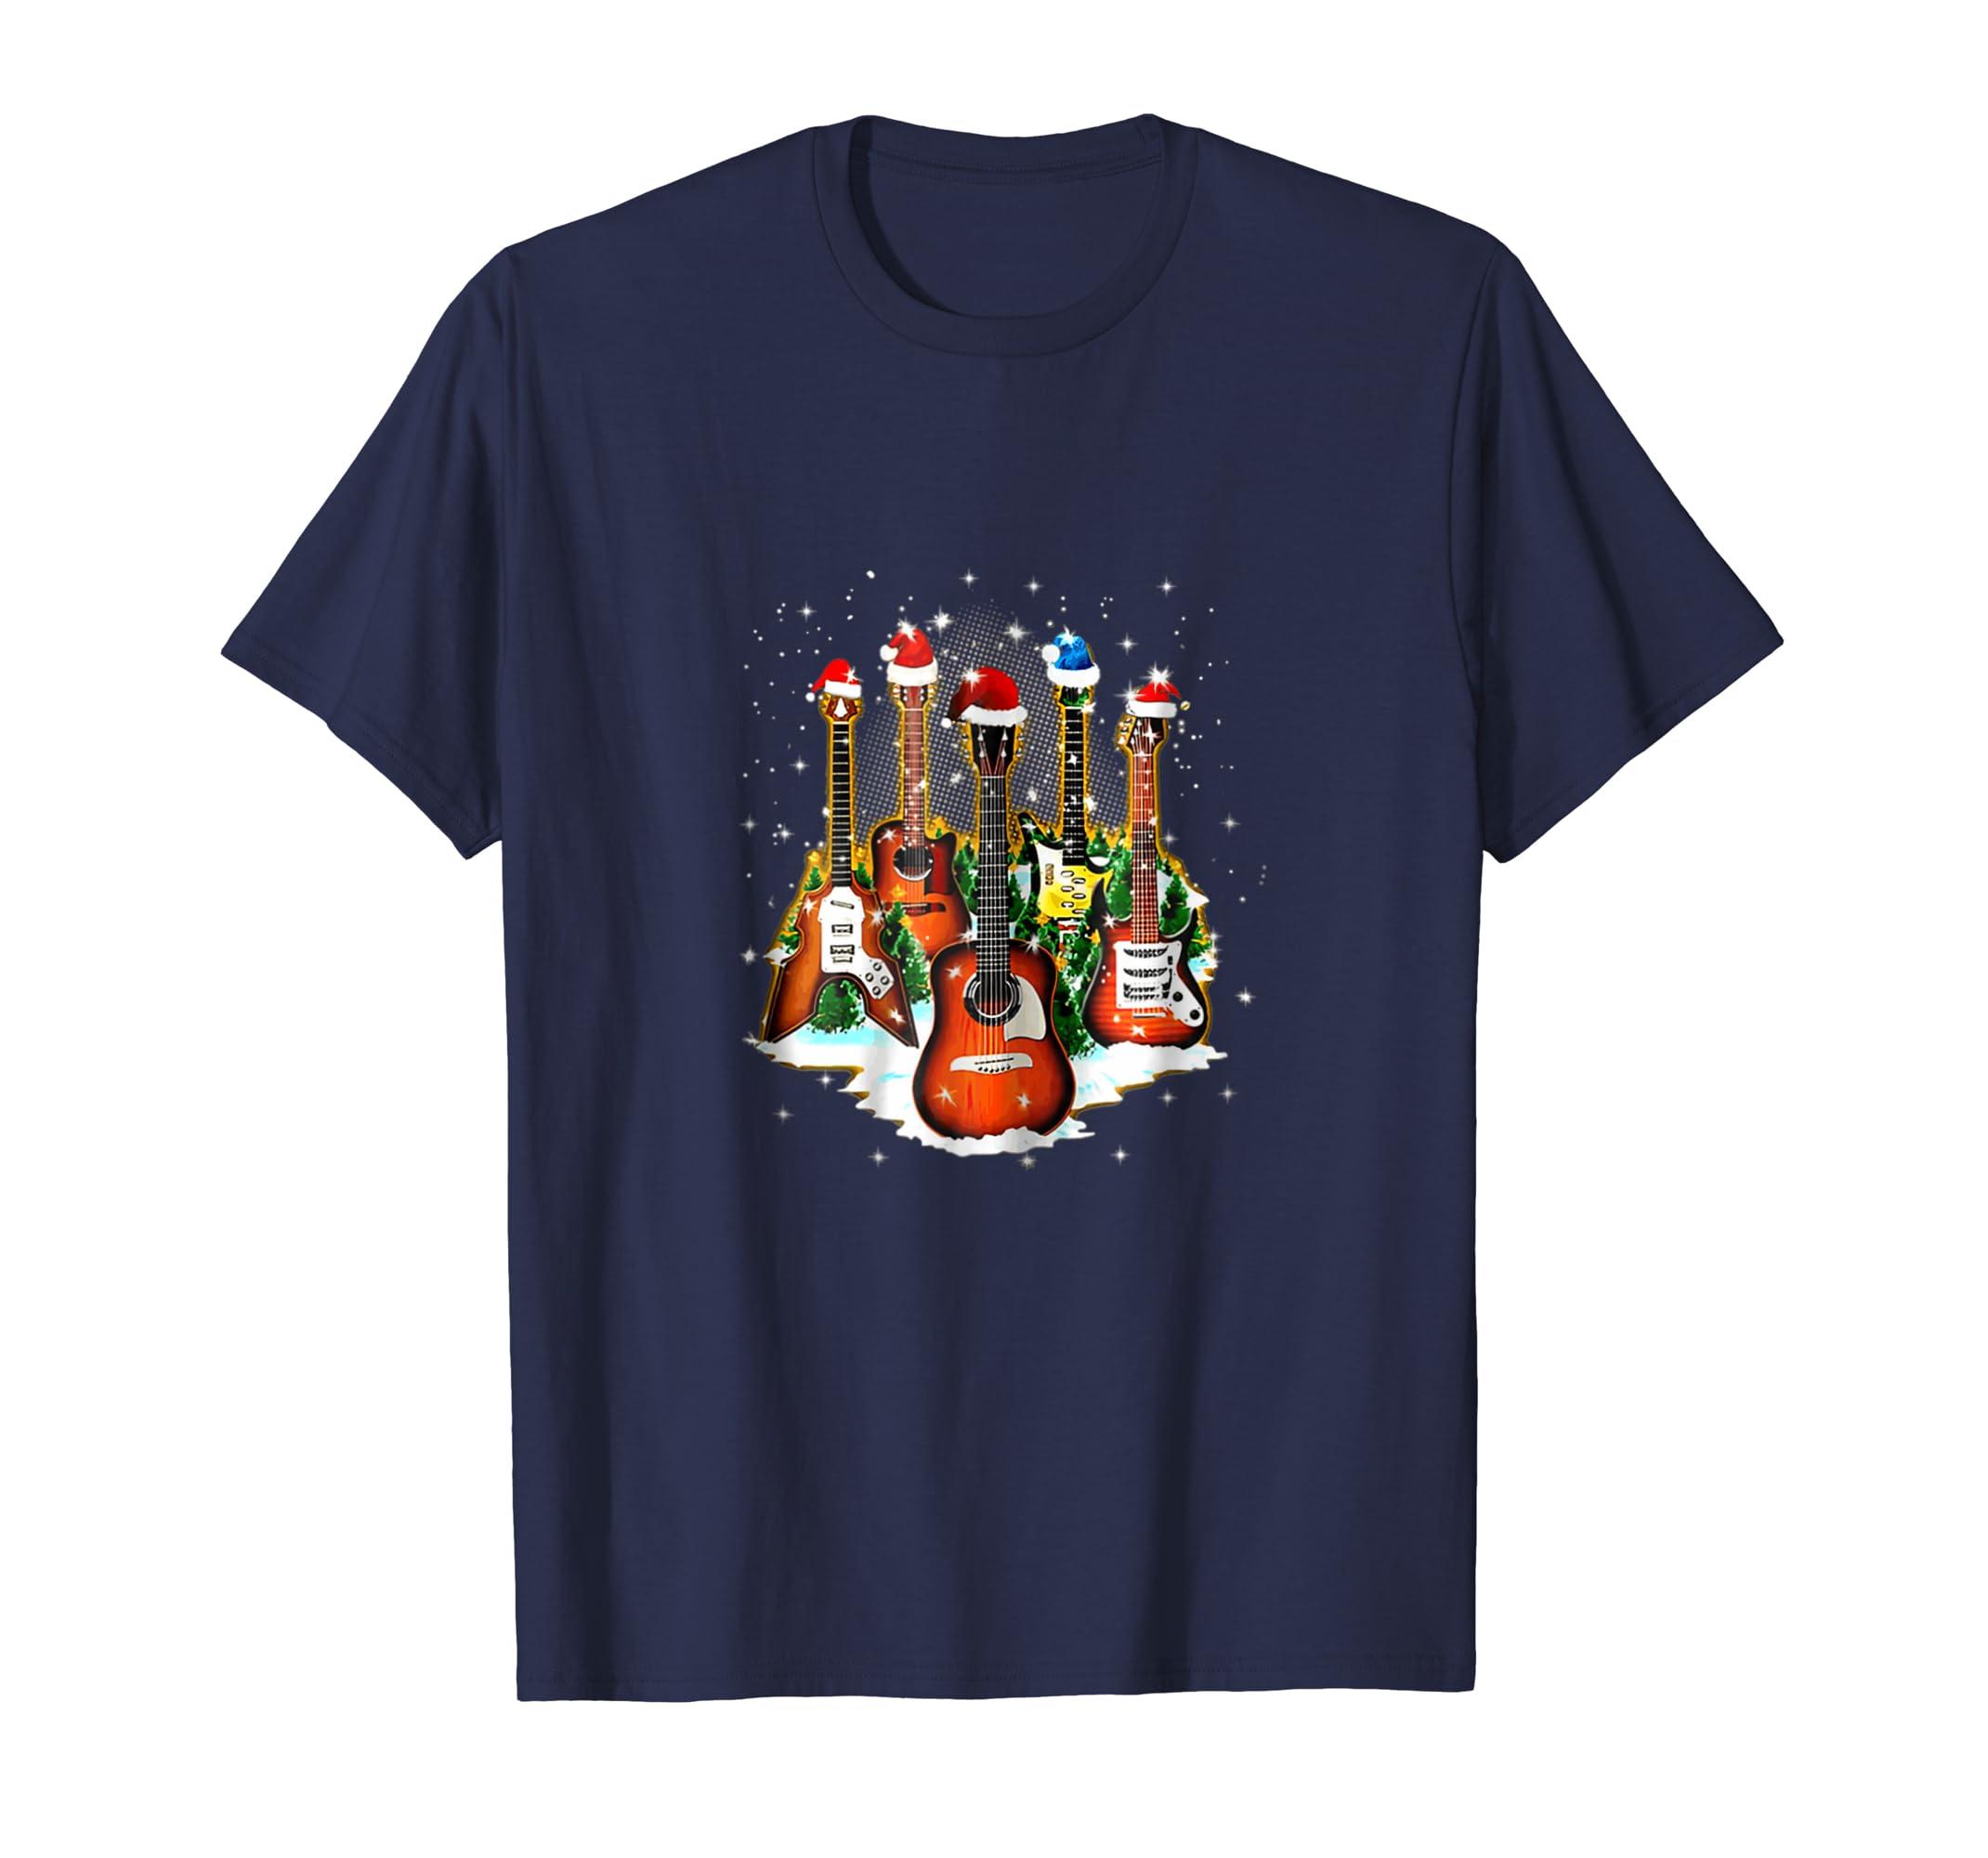 Funny Vitage Guitar Christmas Tshirt For Guitar Lovers-azvn